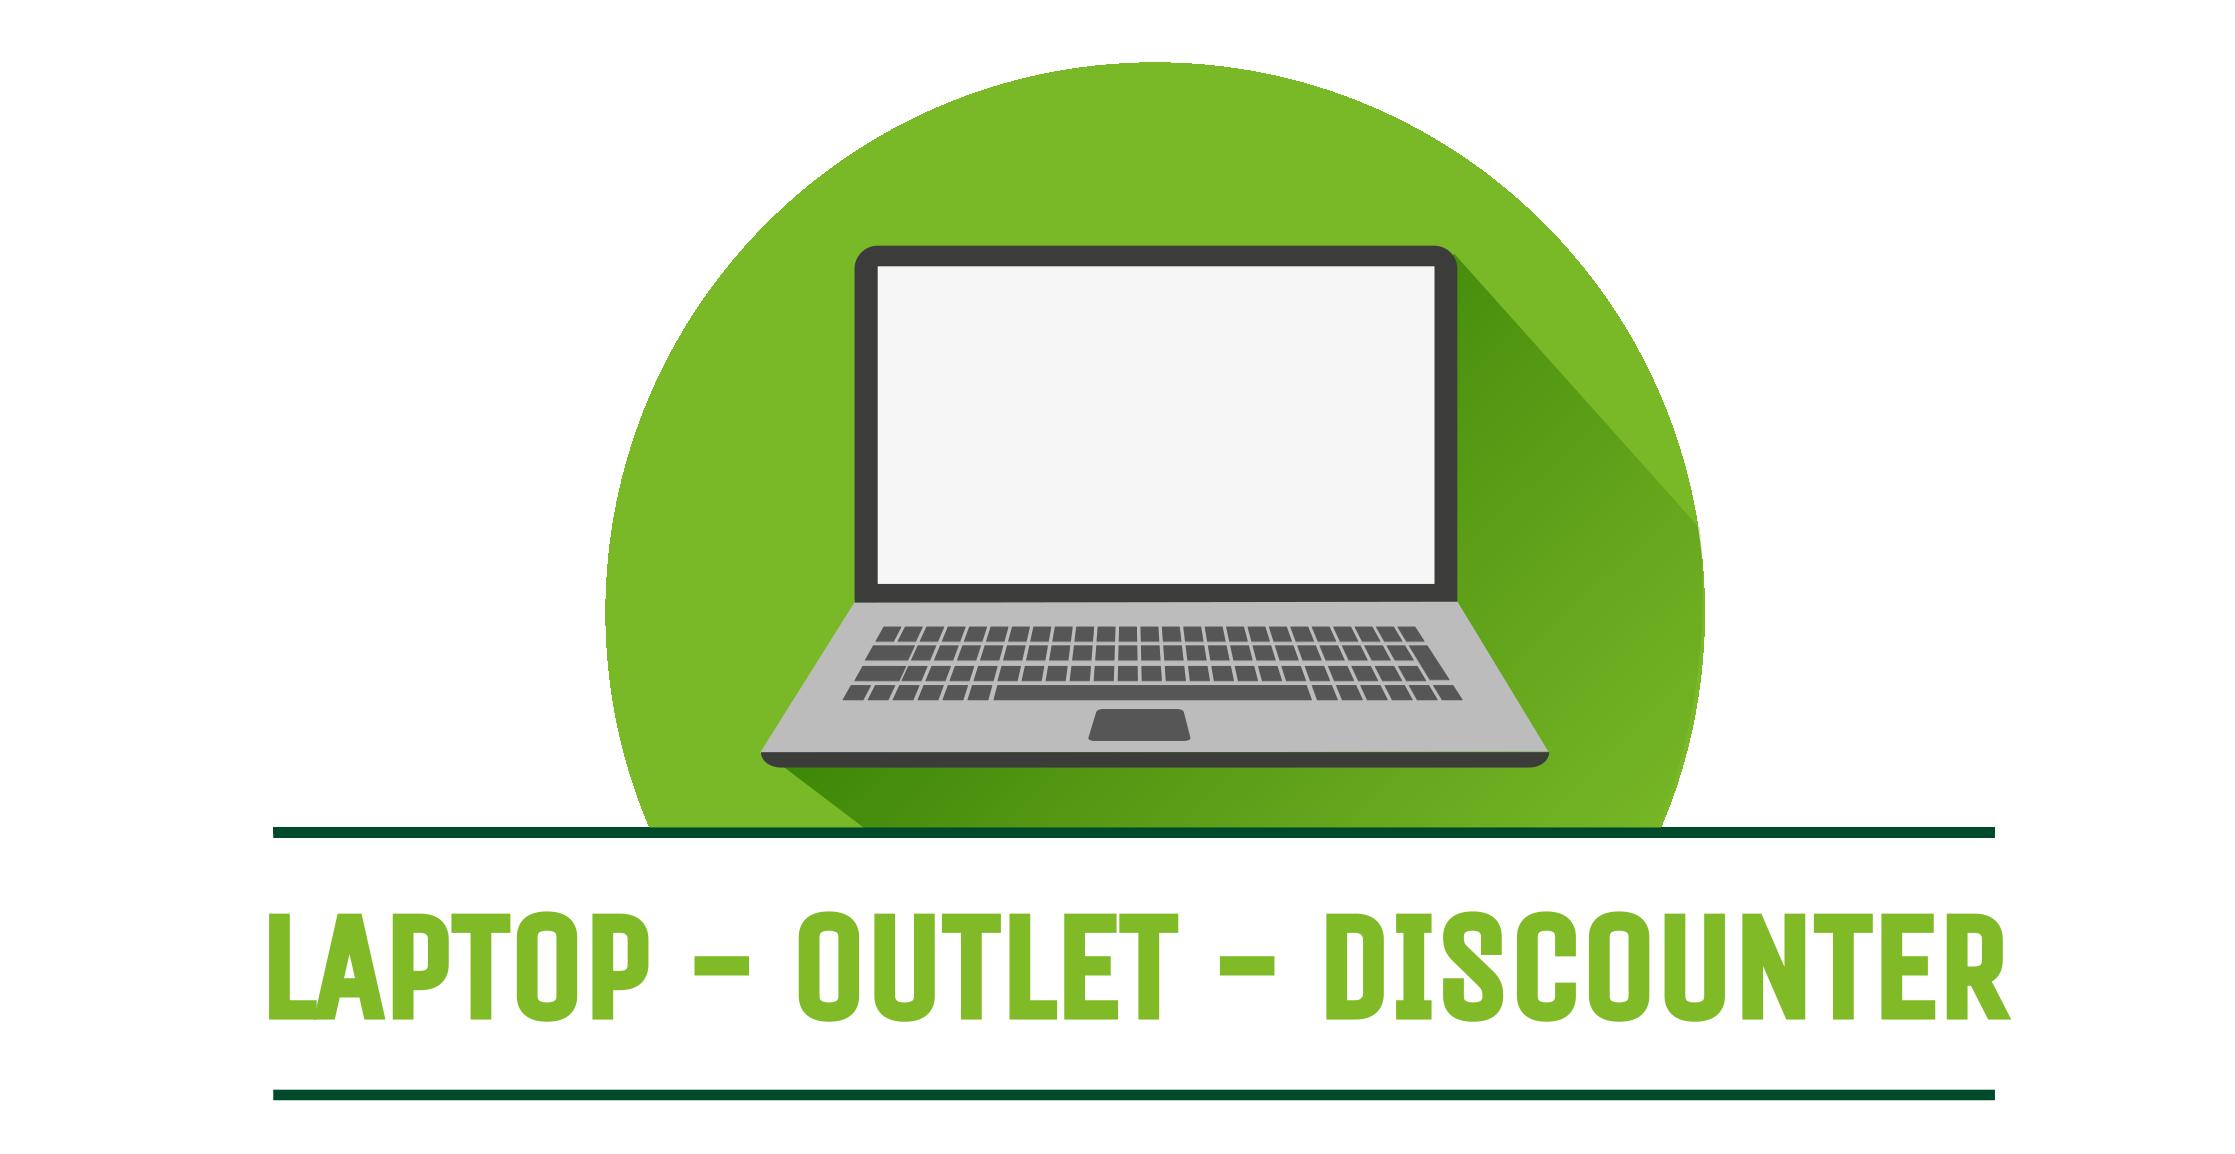 Laptop Outlet Discounter